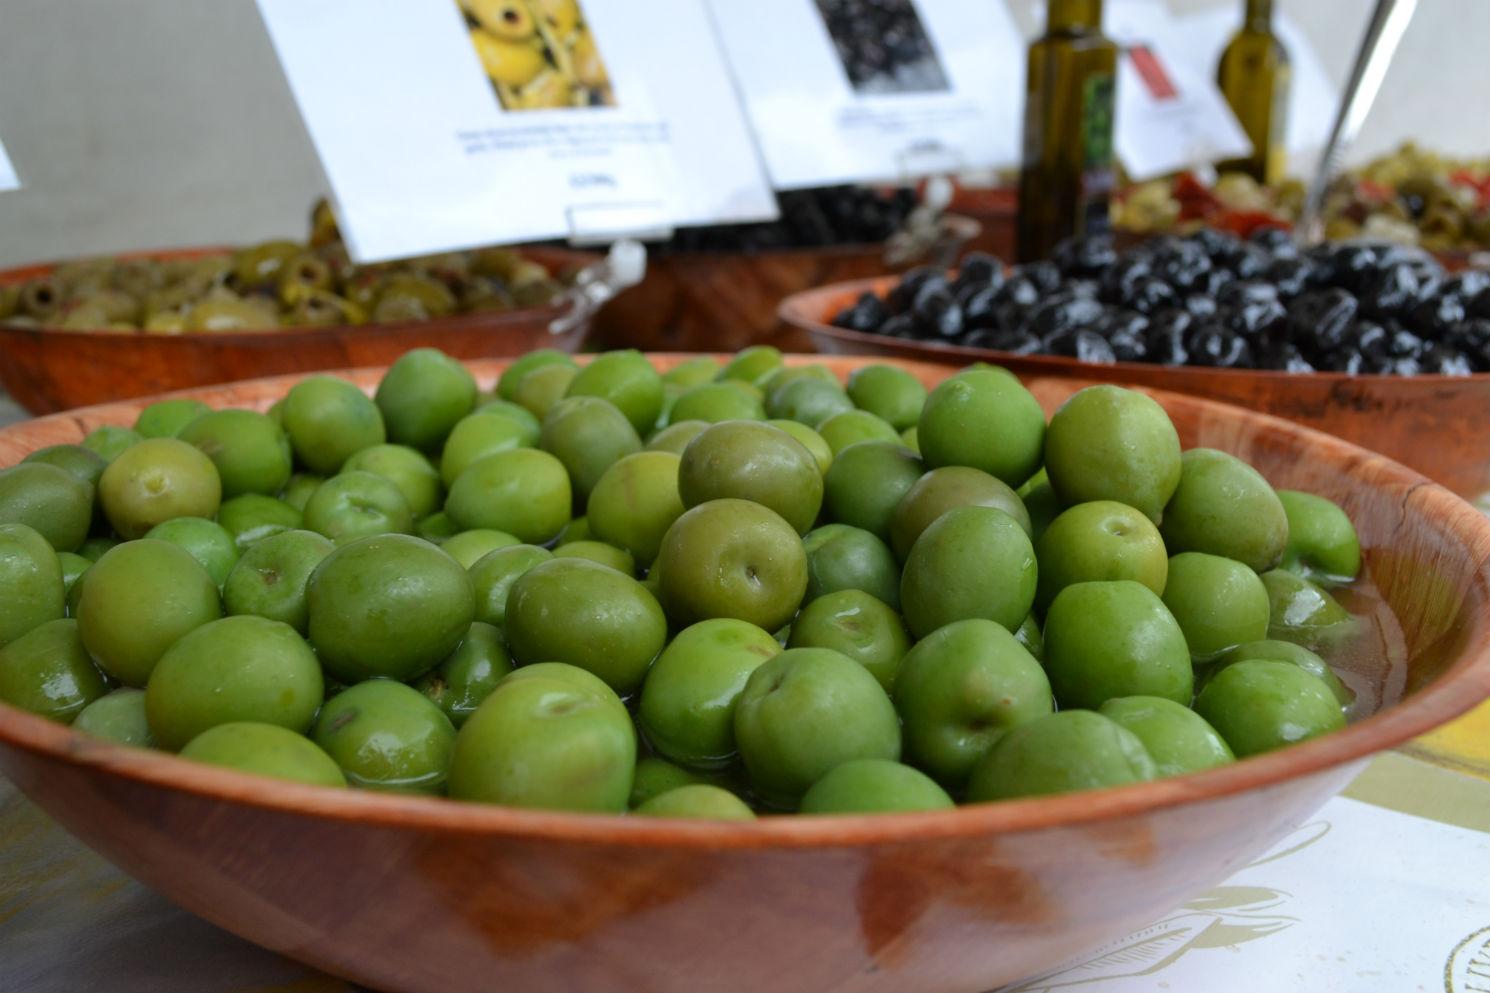 Sicilian Nocellara: slightly dark green, buttery and pretty sweet. Photo: SE